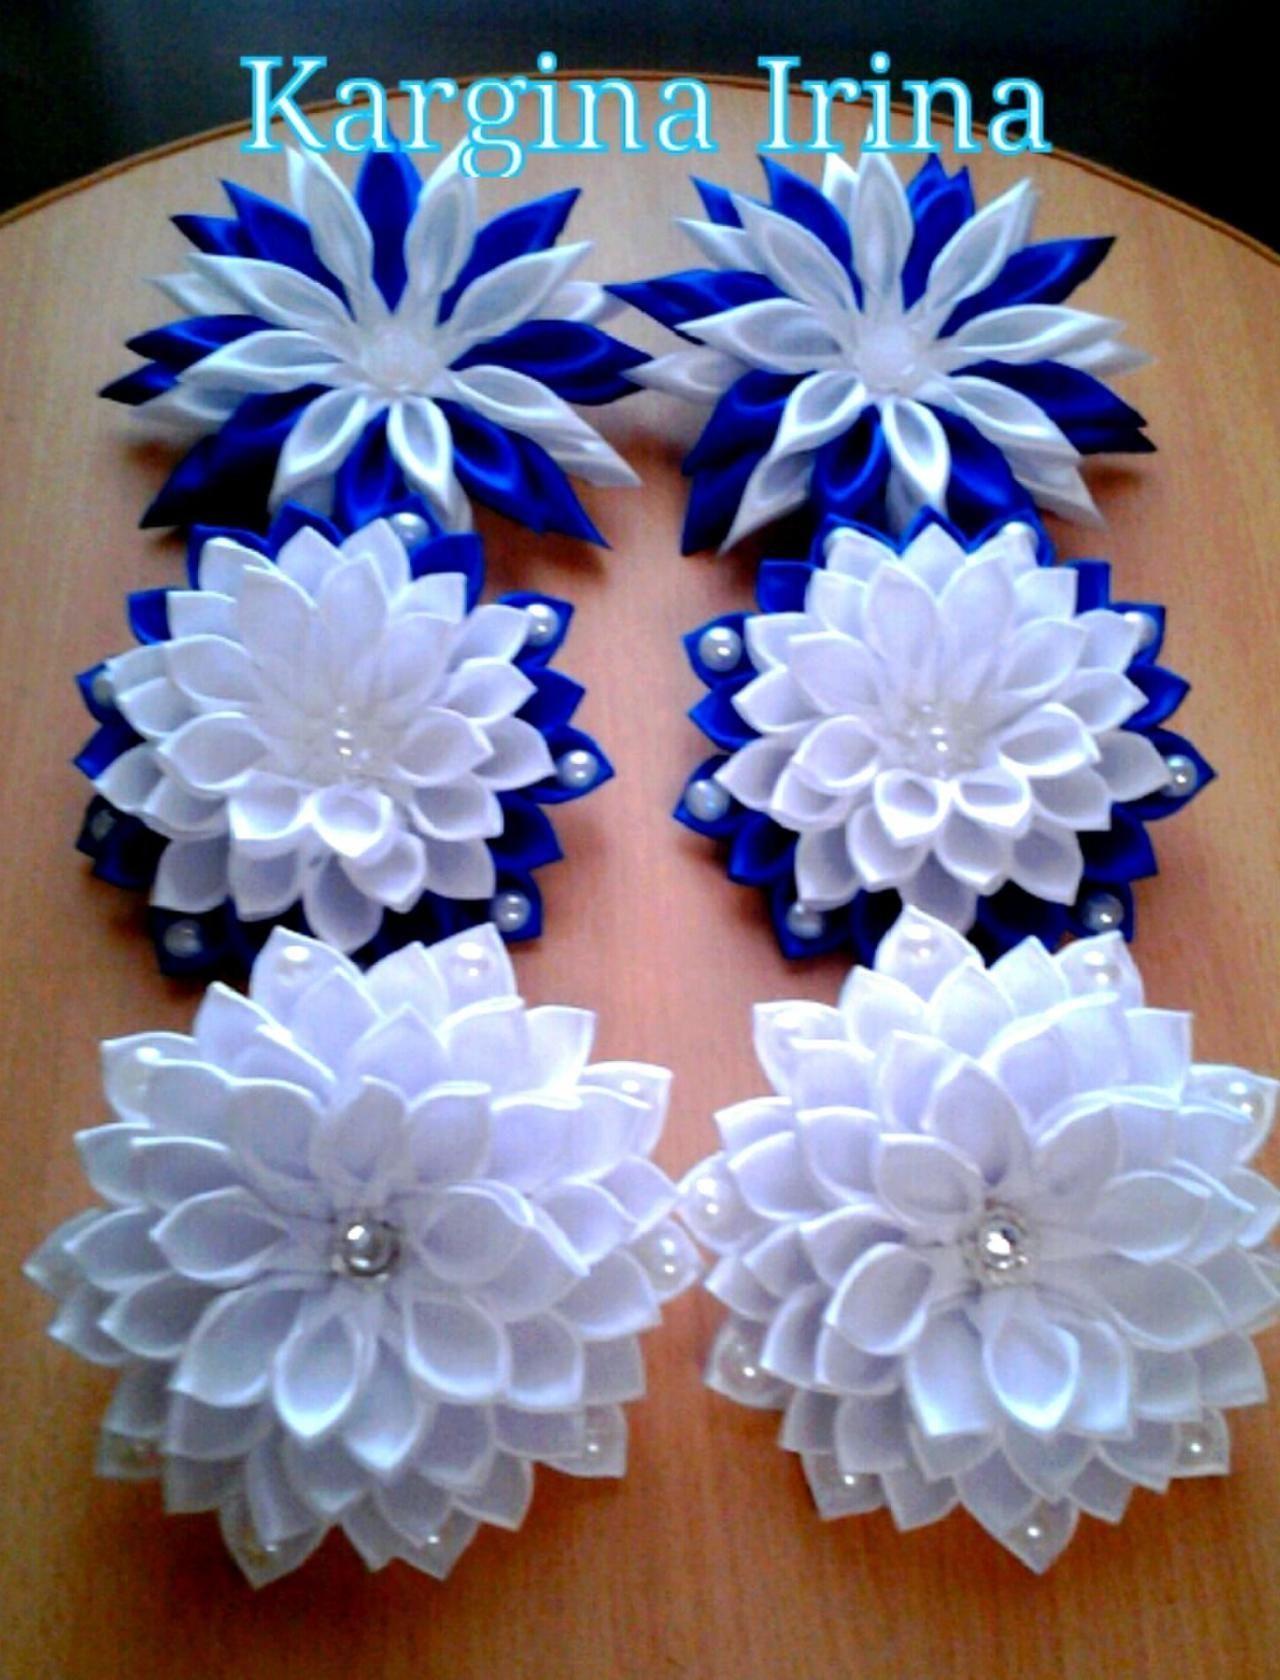 Я вам помогу!Все о Канзаши. Все МК на mamakuban.ru   OK.RU - MyKingList.com #ribbonflower